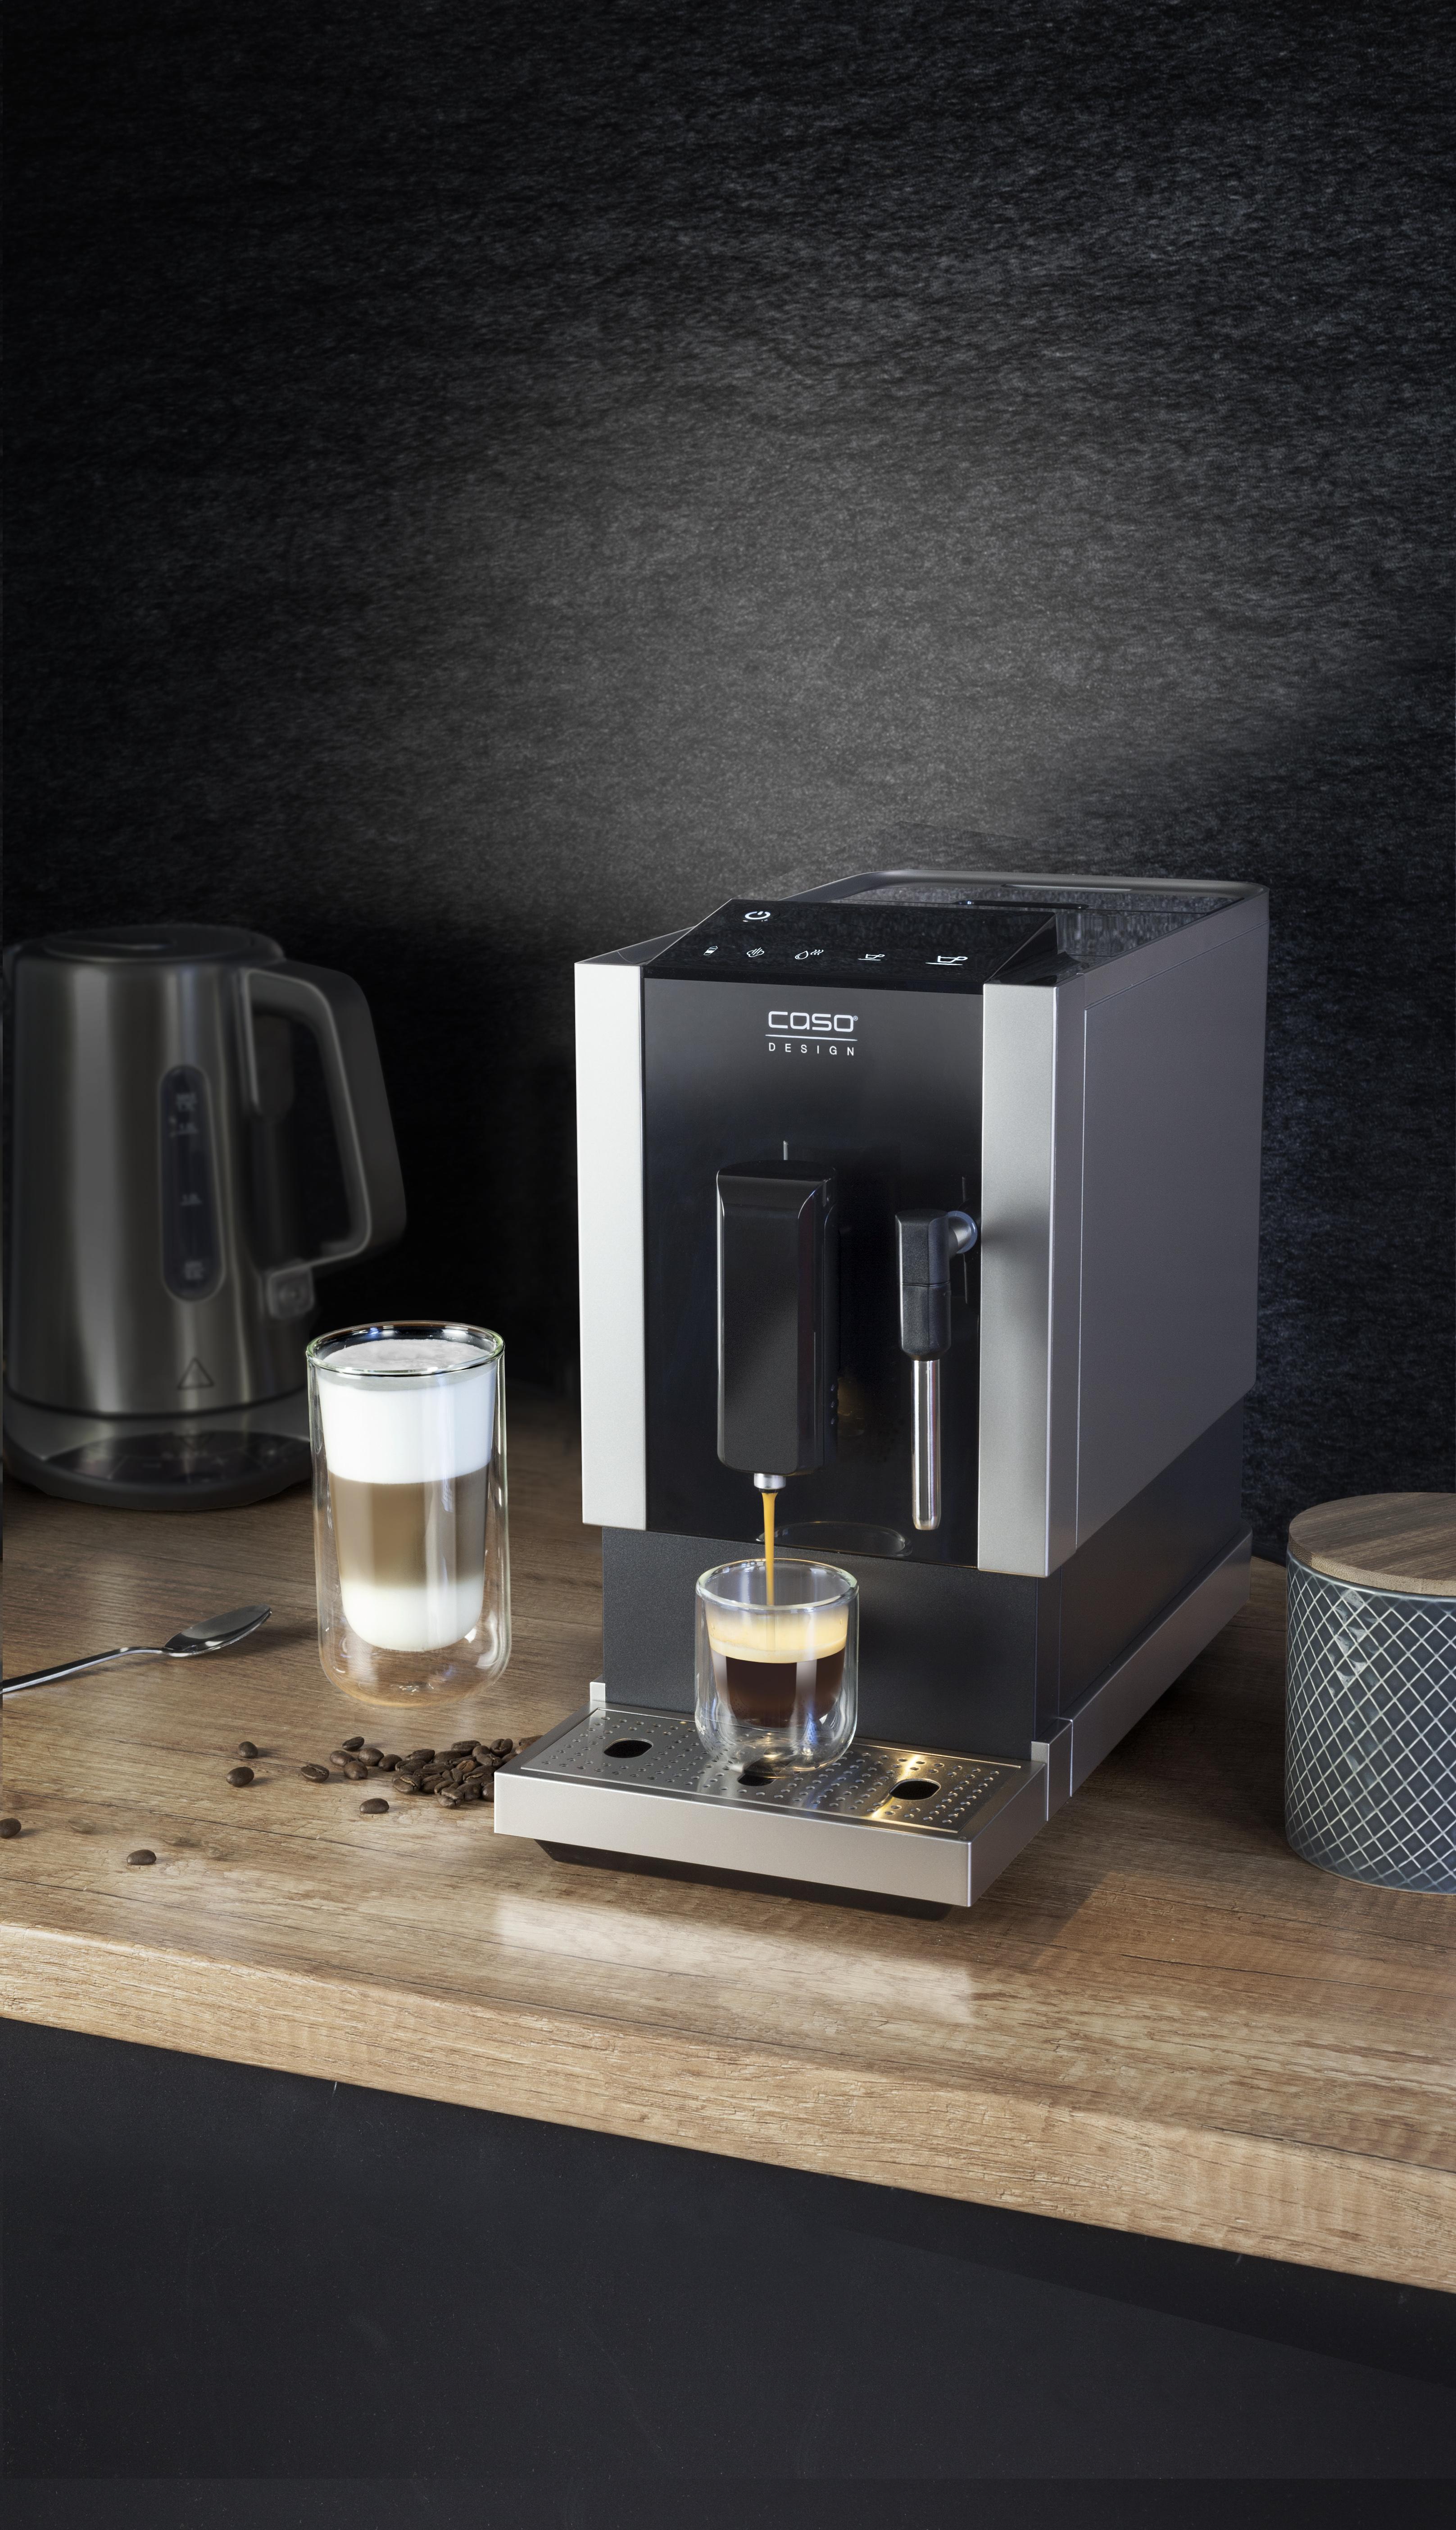 design fully automatic coffee machine caso caf crema one. Black Bedroom Furniture Sets. Home Design Ideas